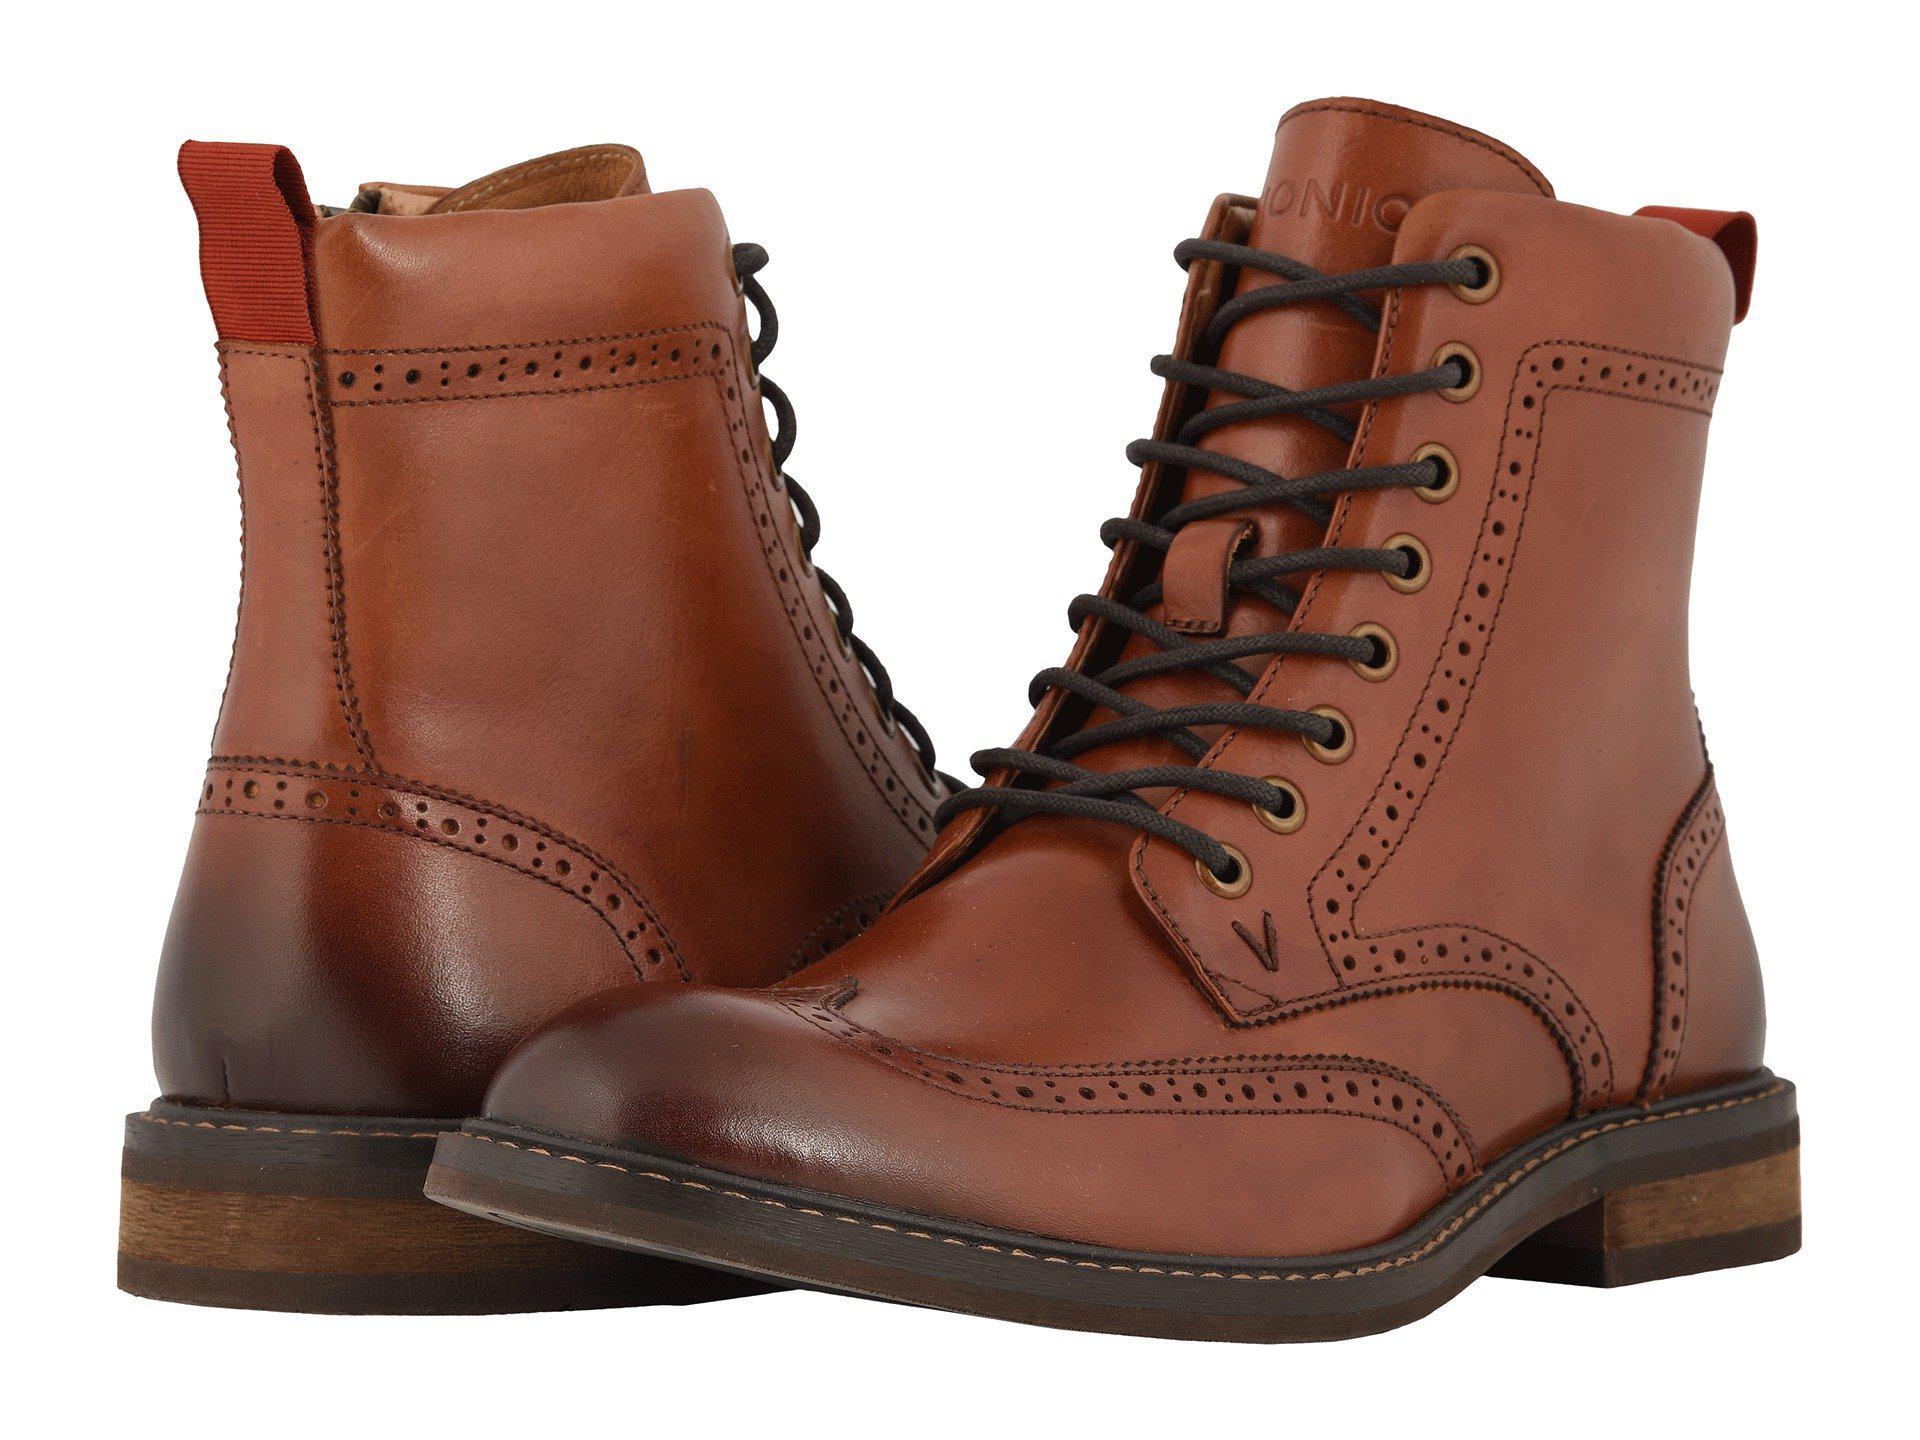 vionic work boots best b7694 98116